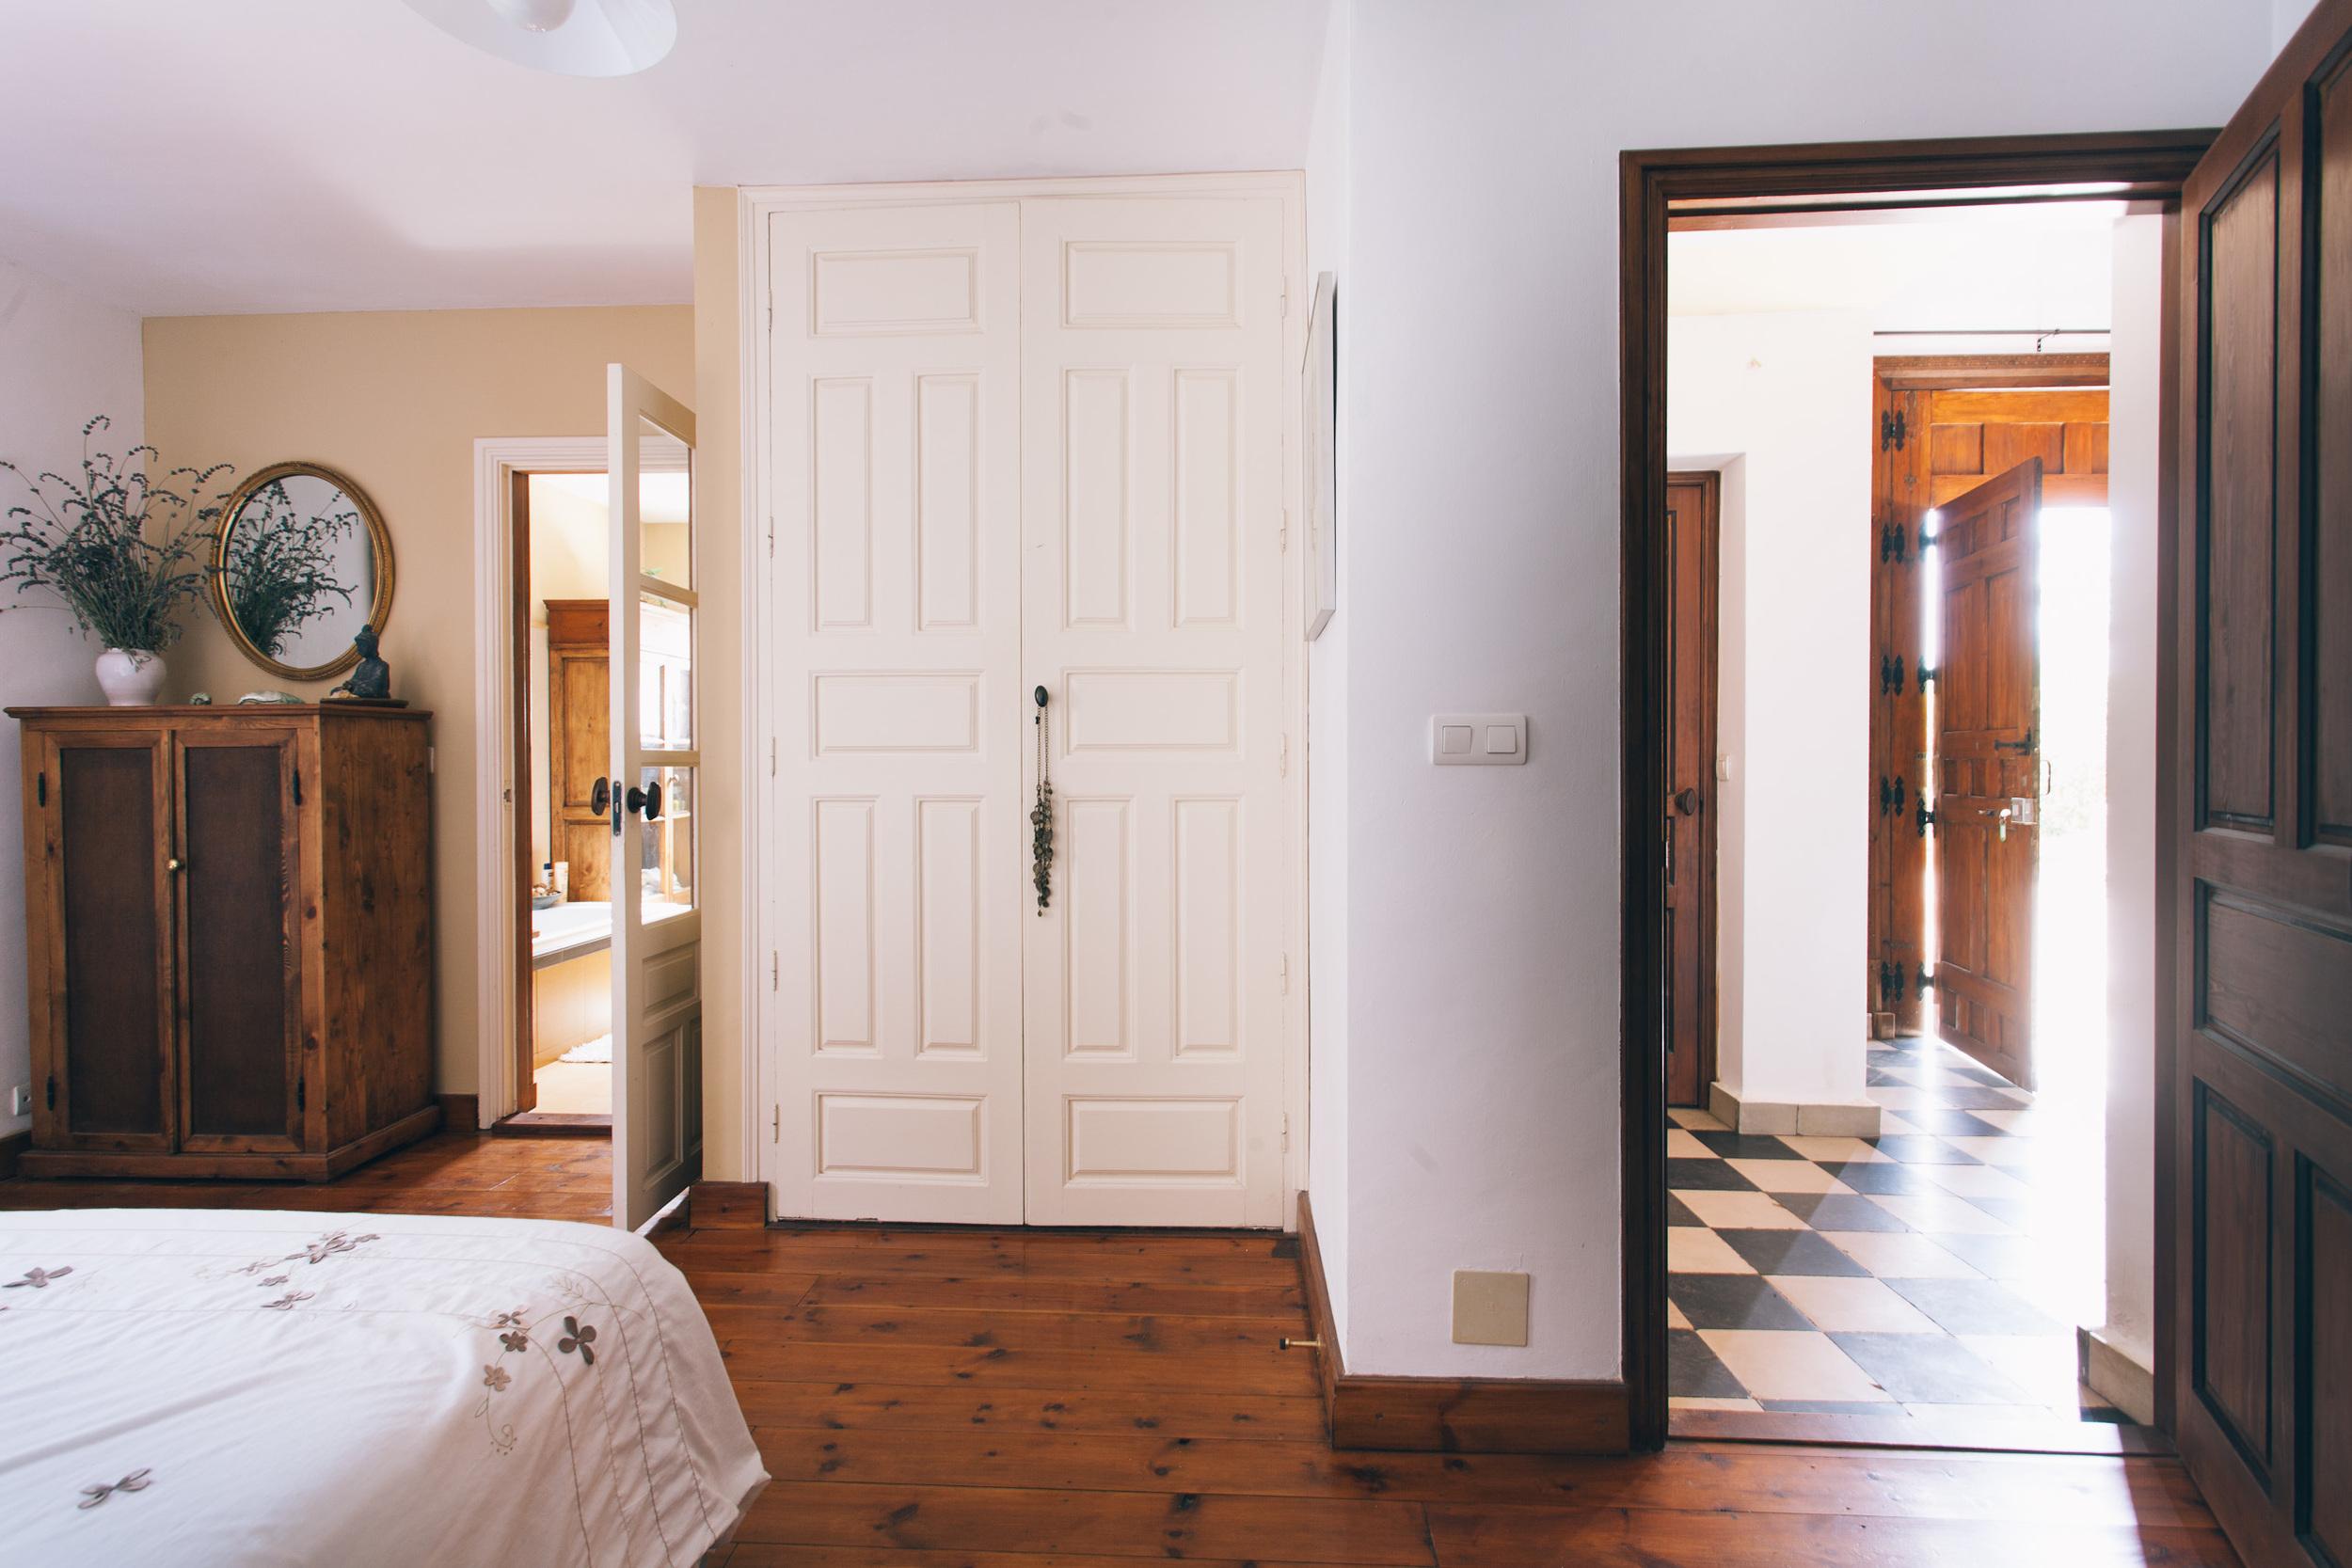 interieur-29.jpg